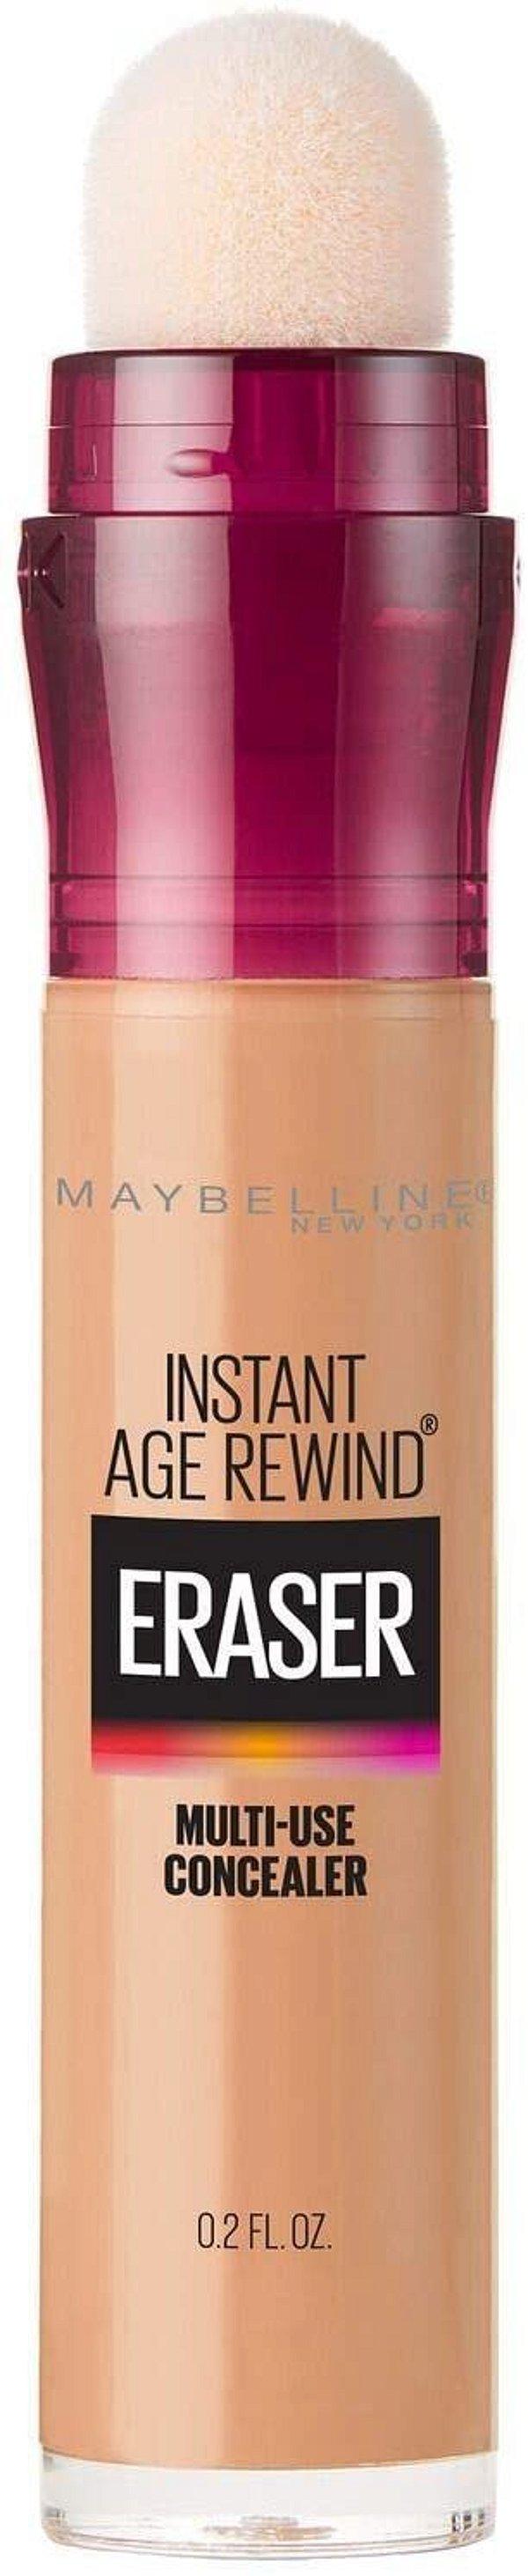 Corretivo Maybelline Instant Age Rewind Eraser cor Medium